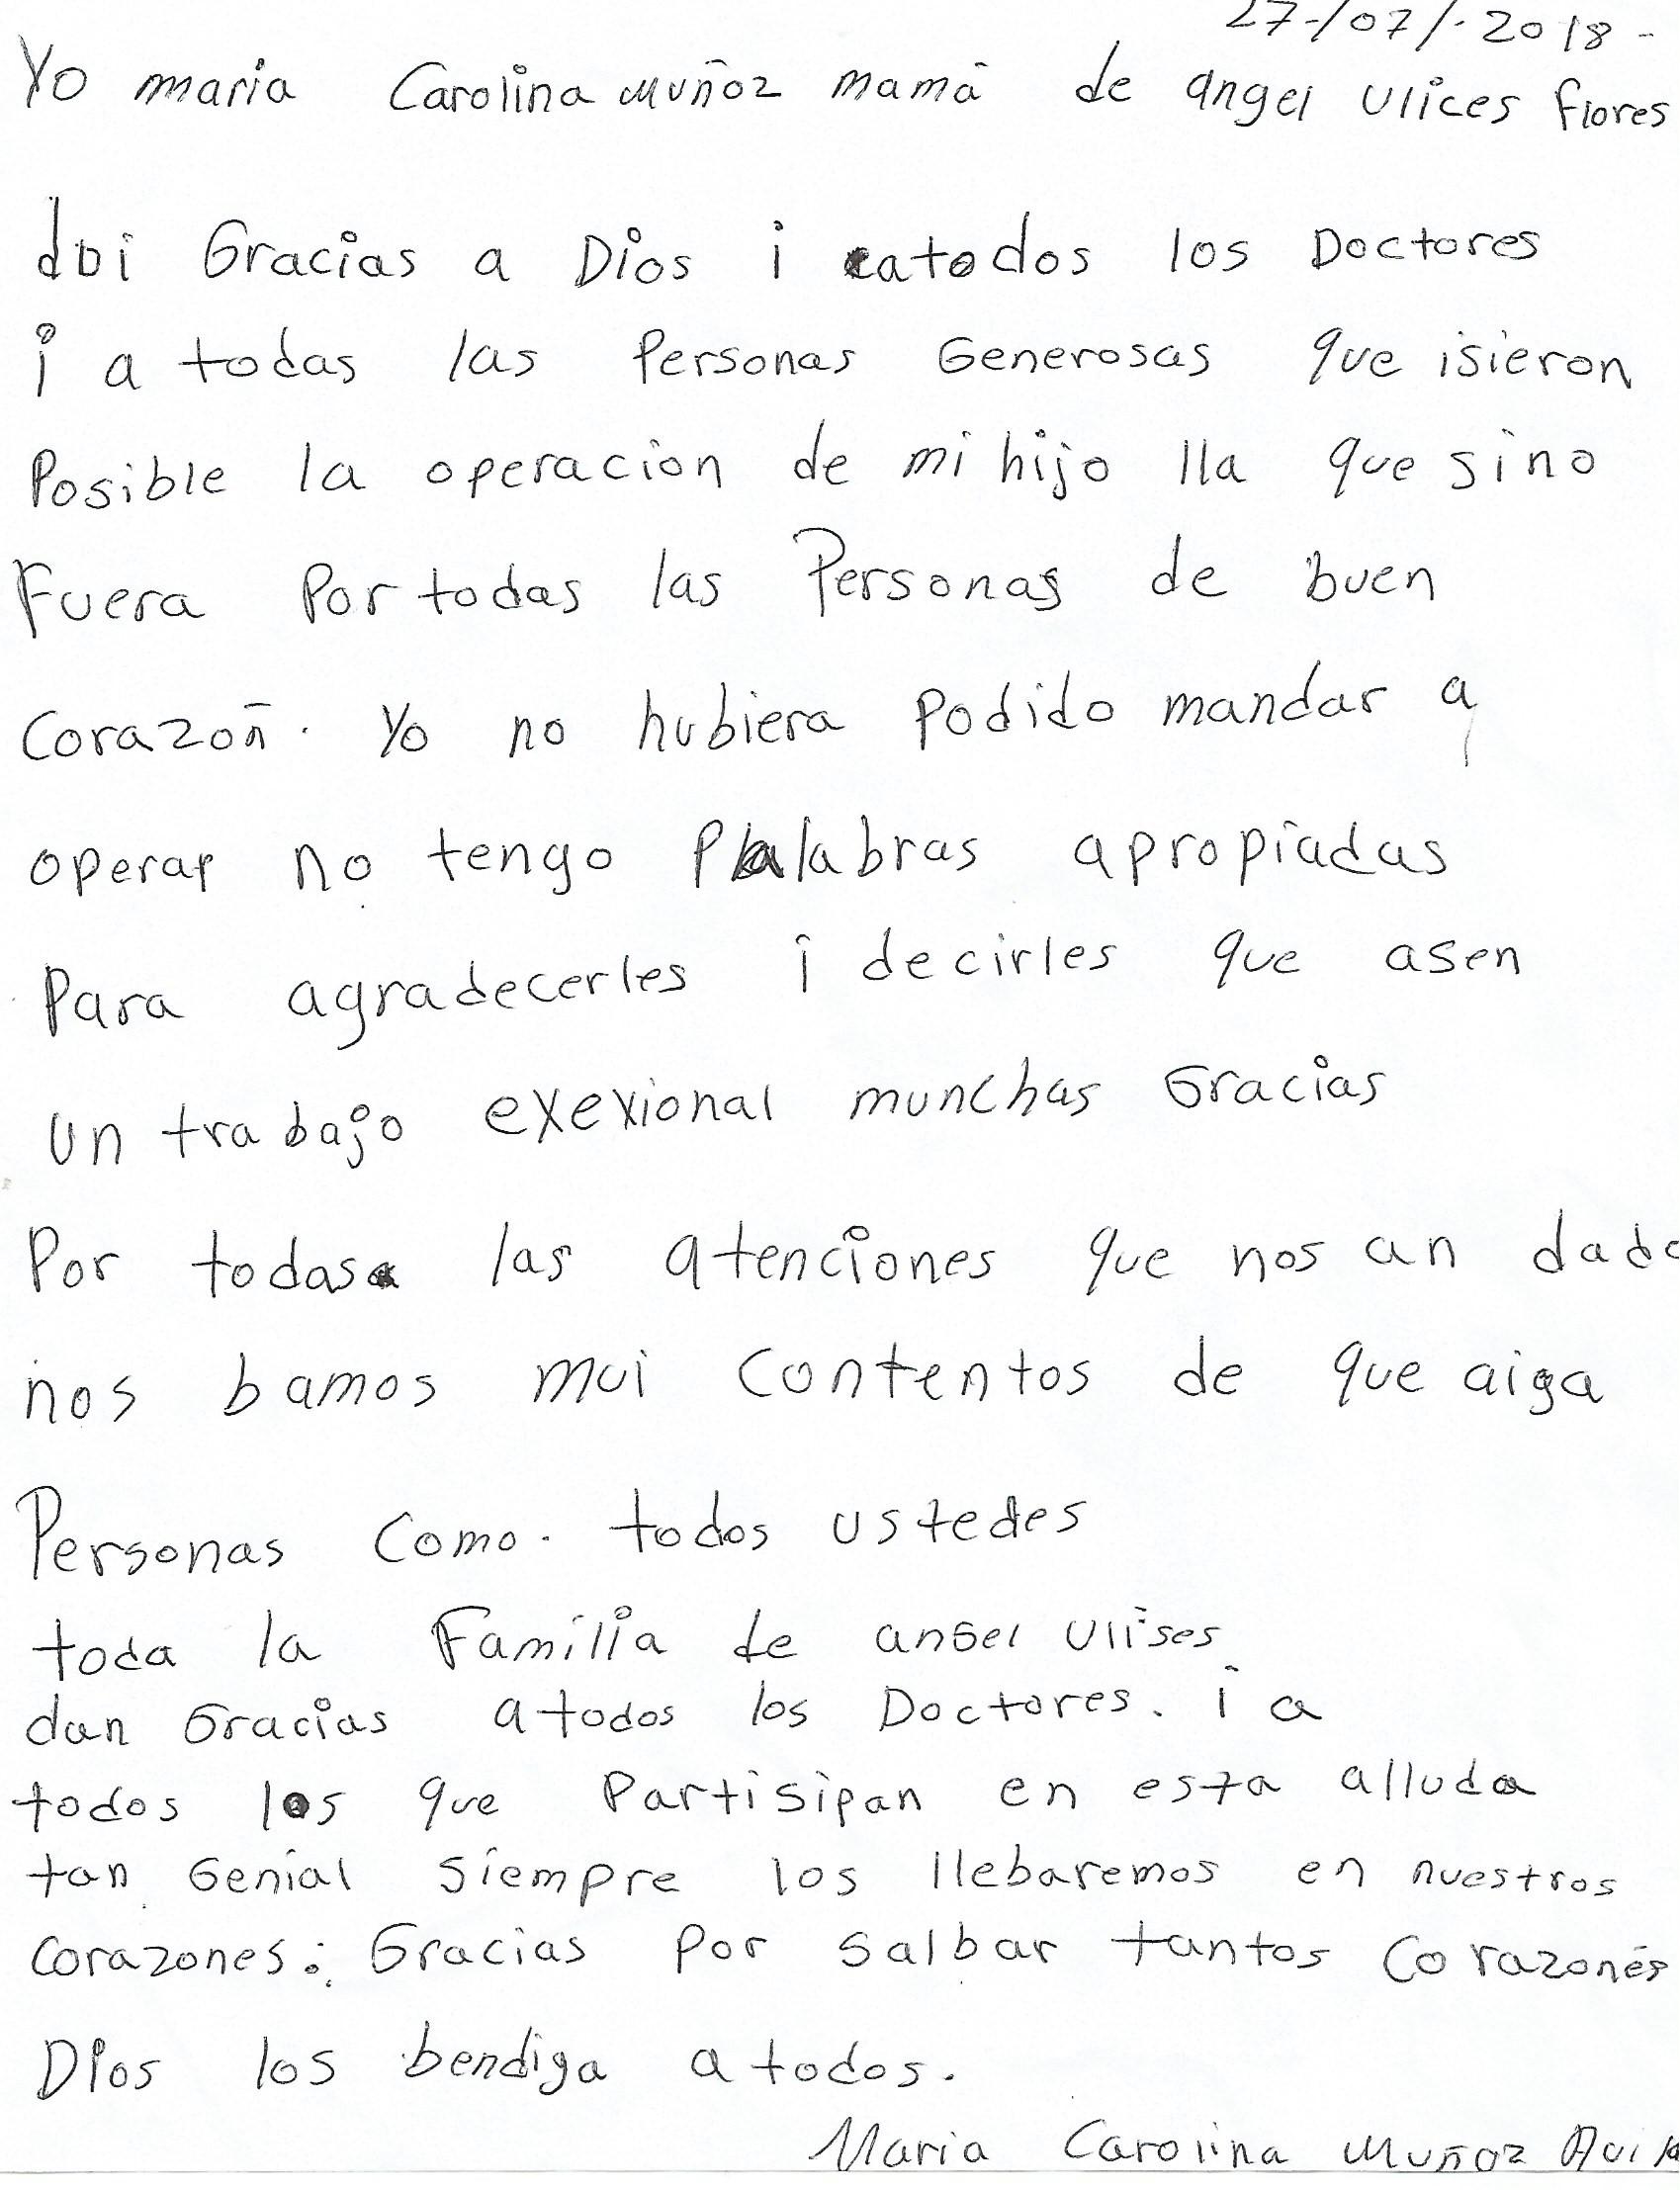 Carta Ángel Ulises